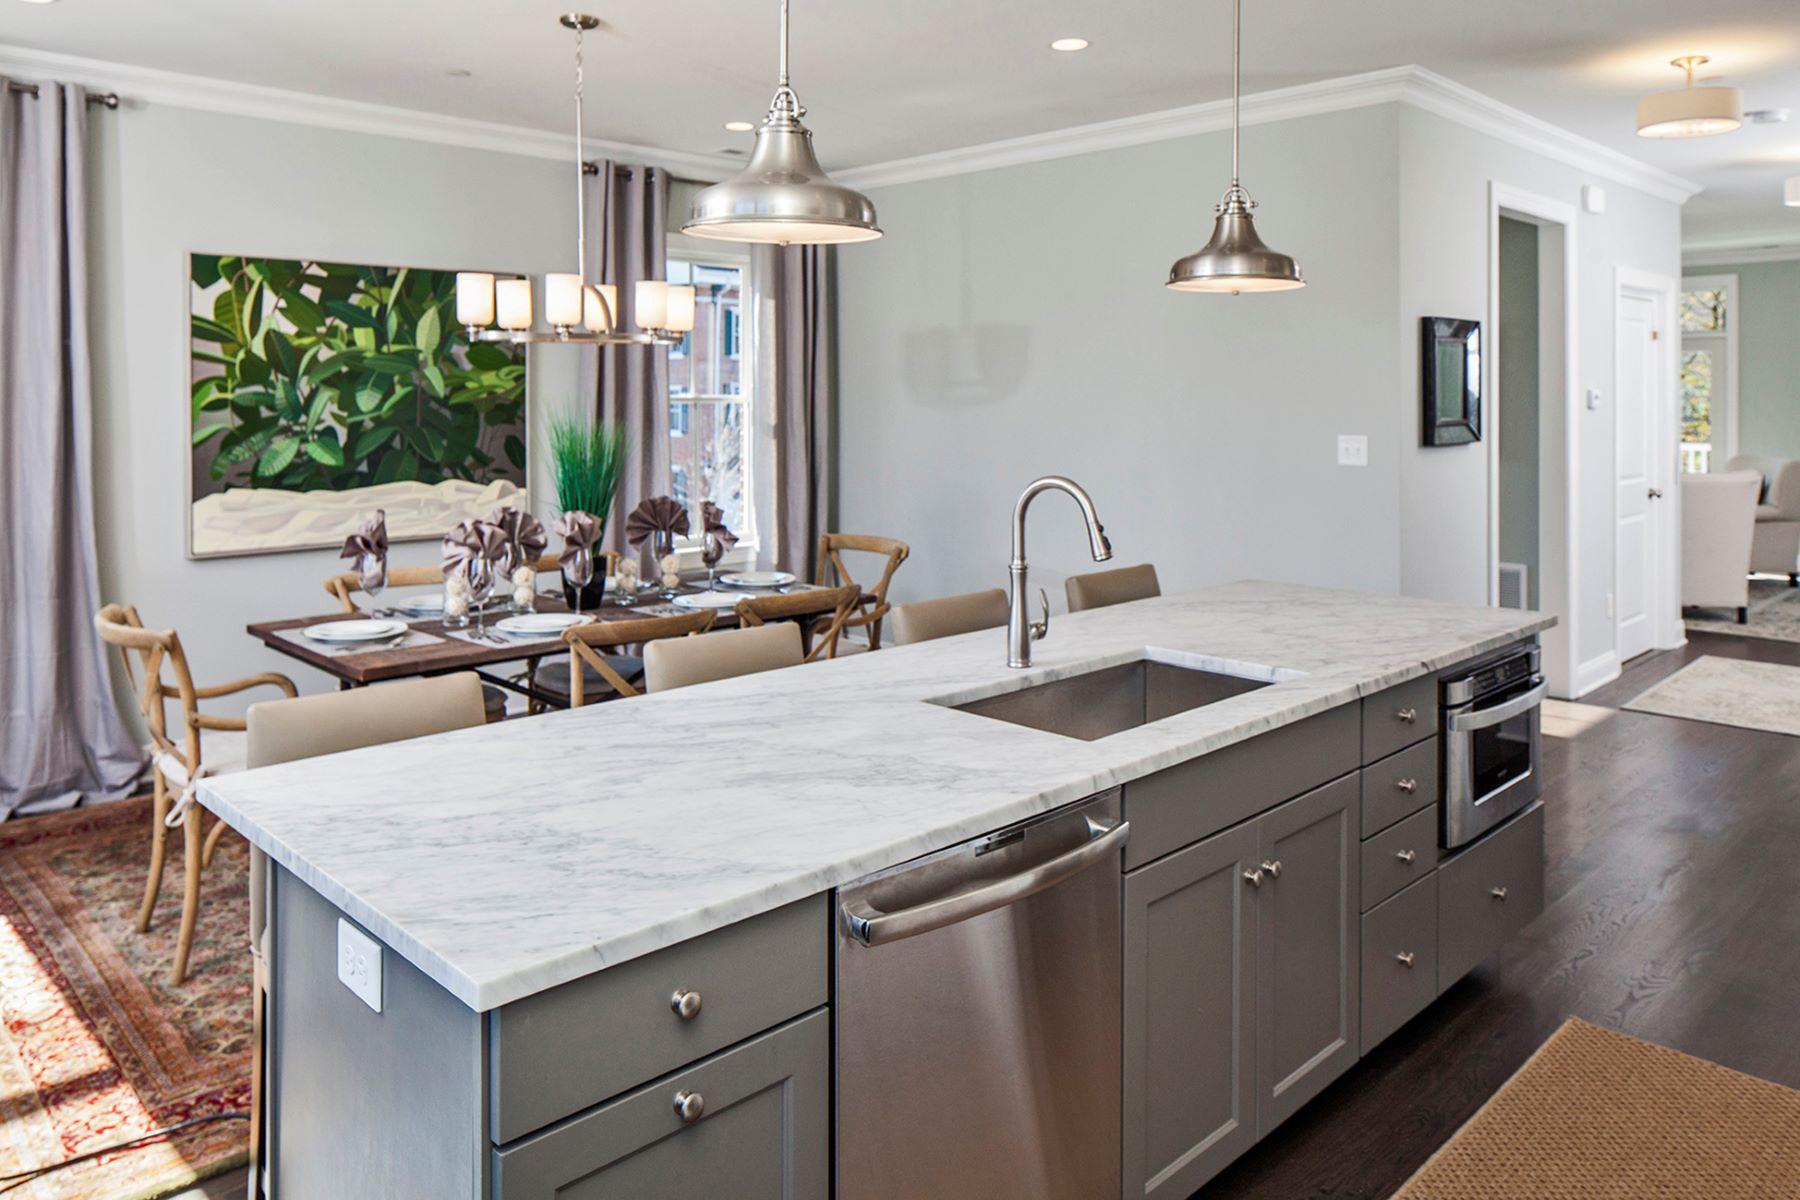 Additional photo for property listing at River Mills at Frenchtown 19 River Mills Drive Frenchtown, Nueva Jersey 08825 Estados Unidos